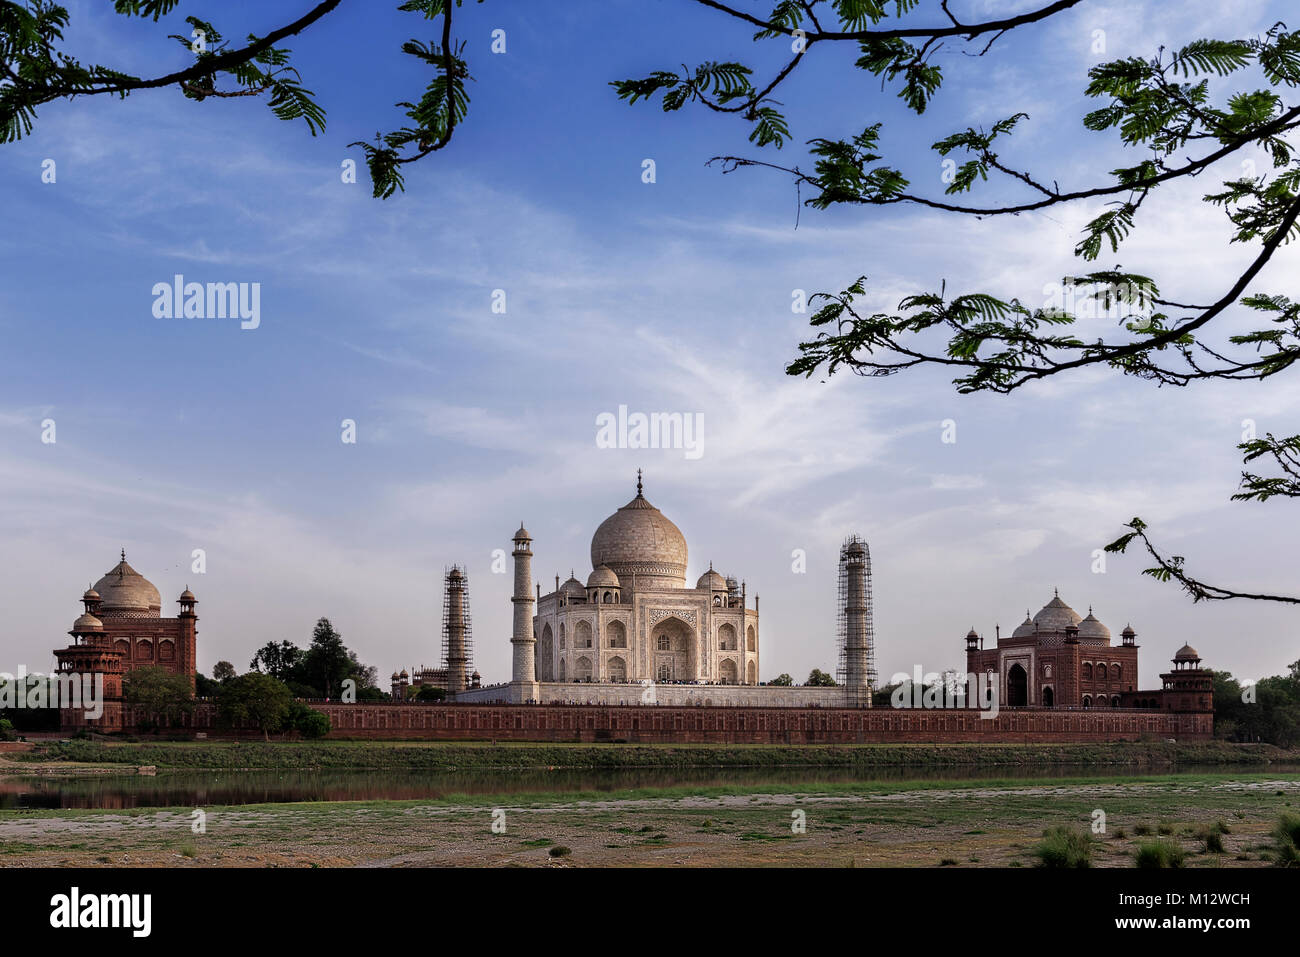 Iconic view of Taj Mahal one of the World Wonders, Agra, India - Stock Image